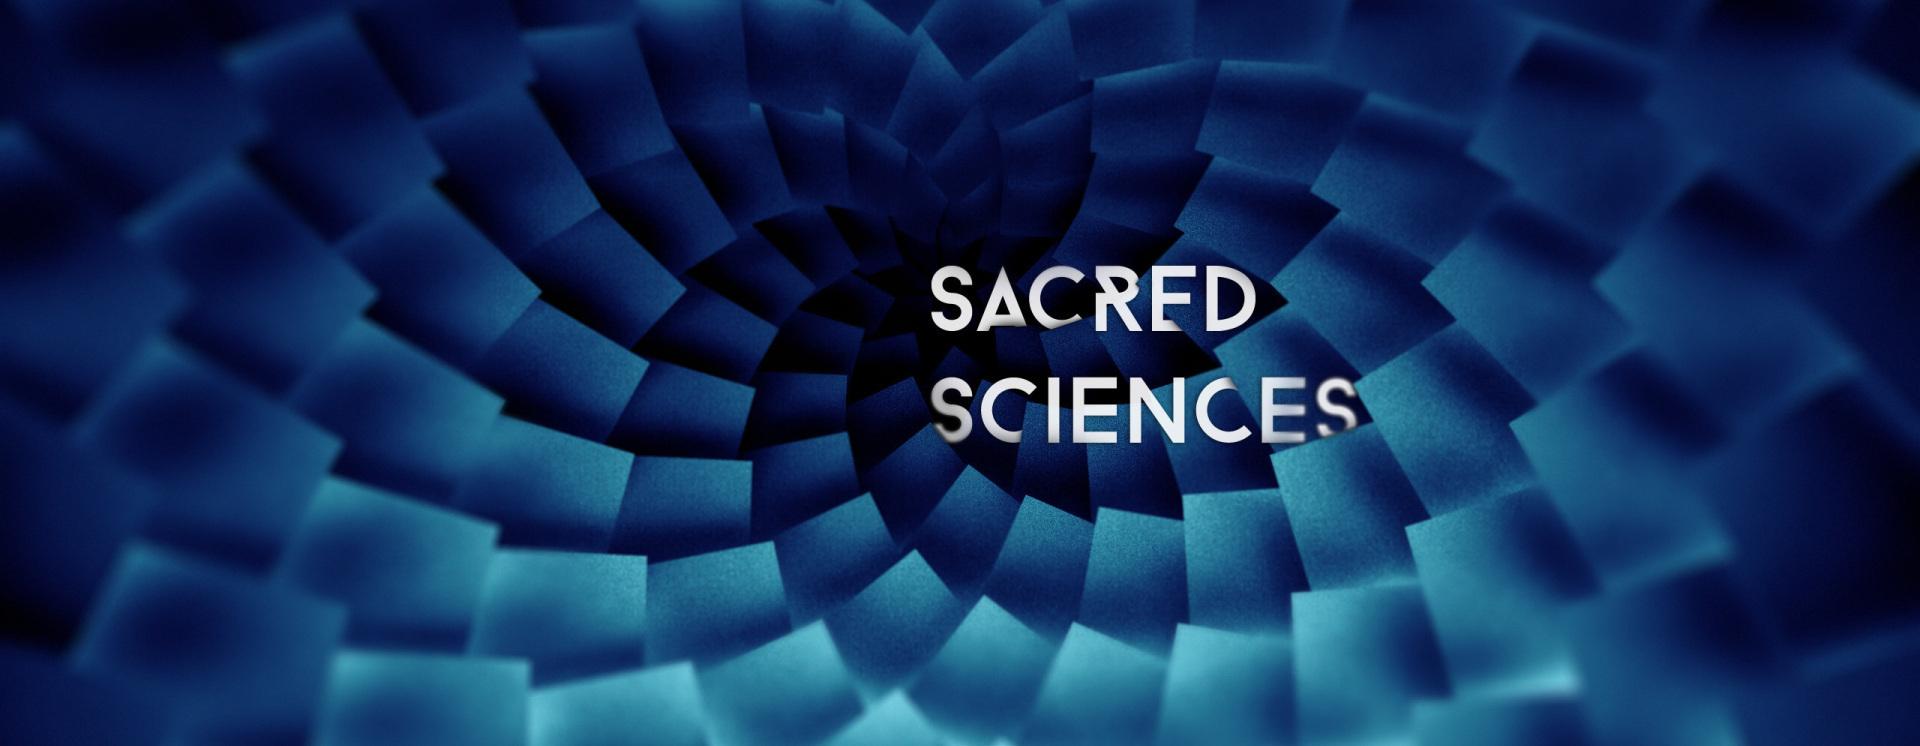 Sacred sciences wall copy